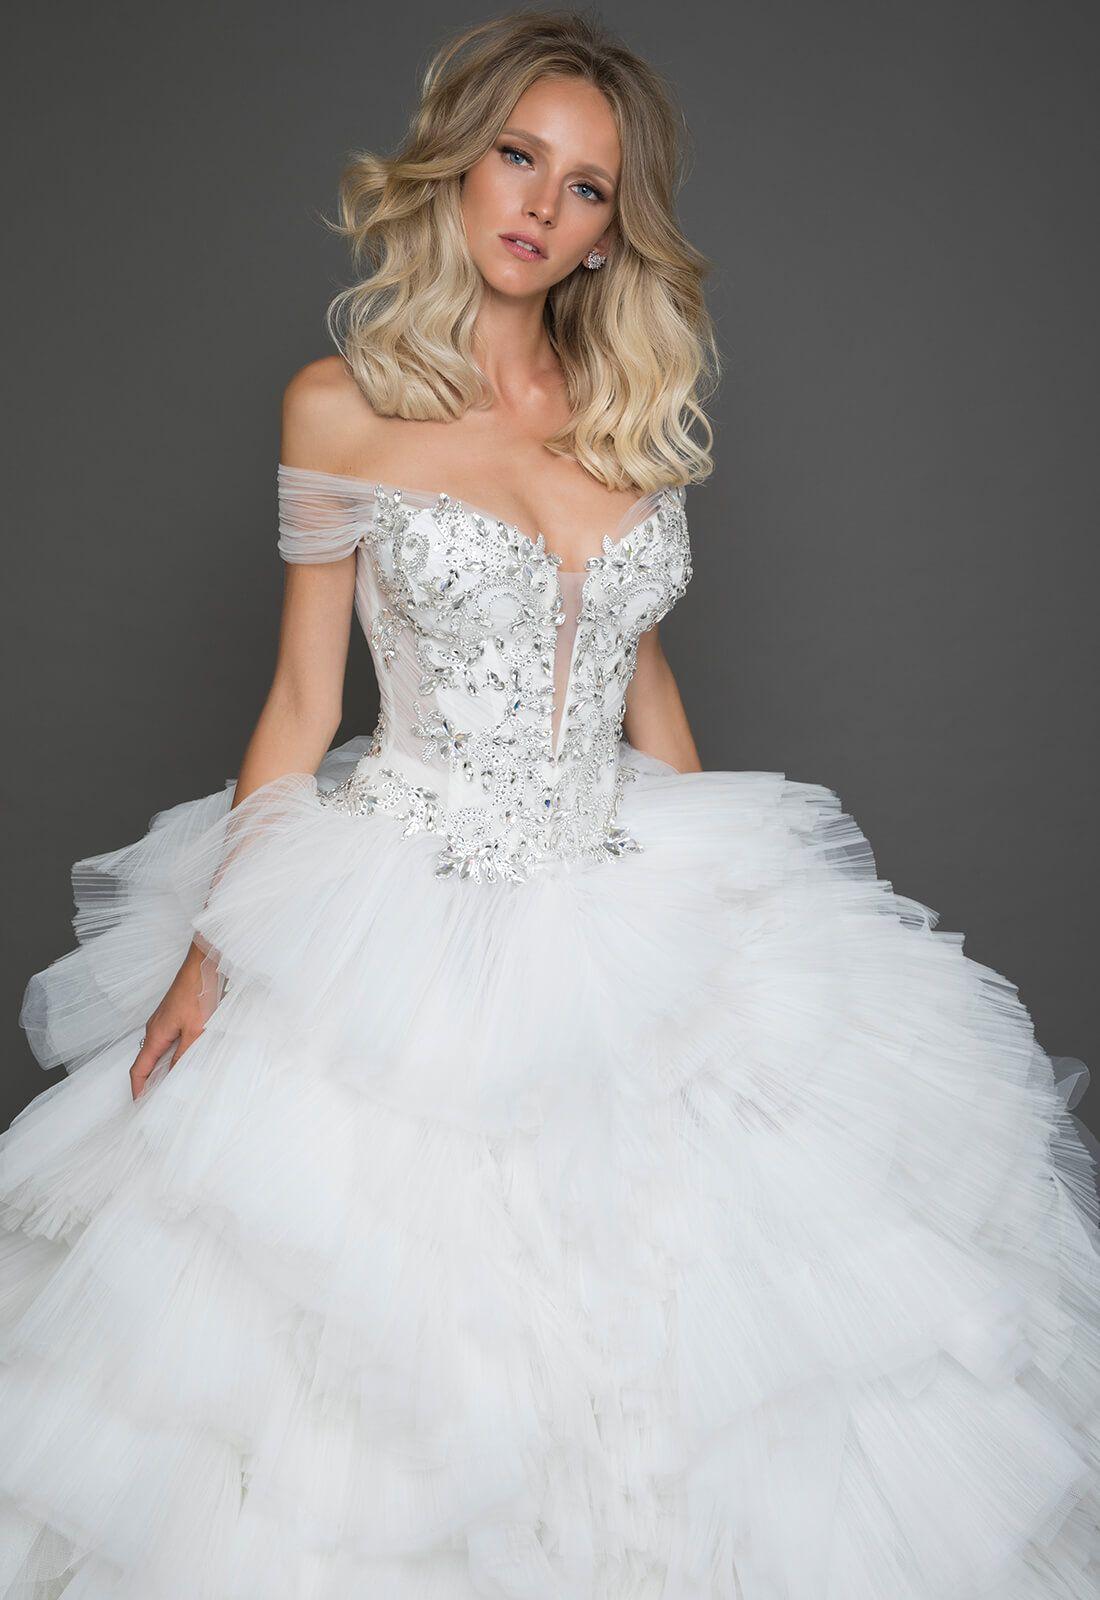 Style no. 4626 | Princess wedding dress | Pinterest | Pnina tornai ...